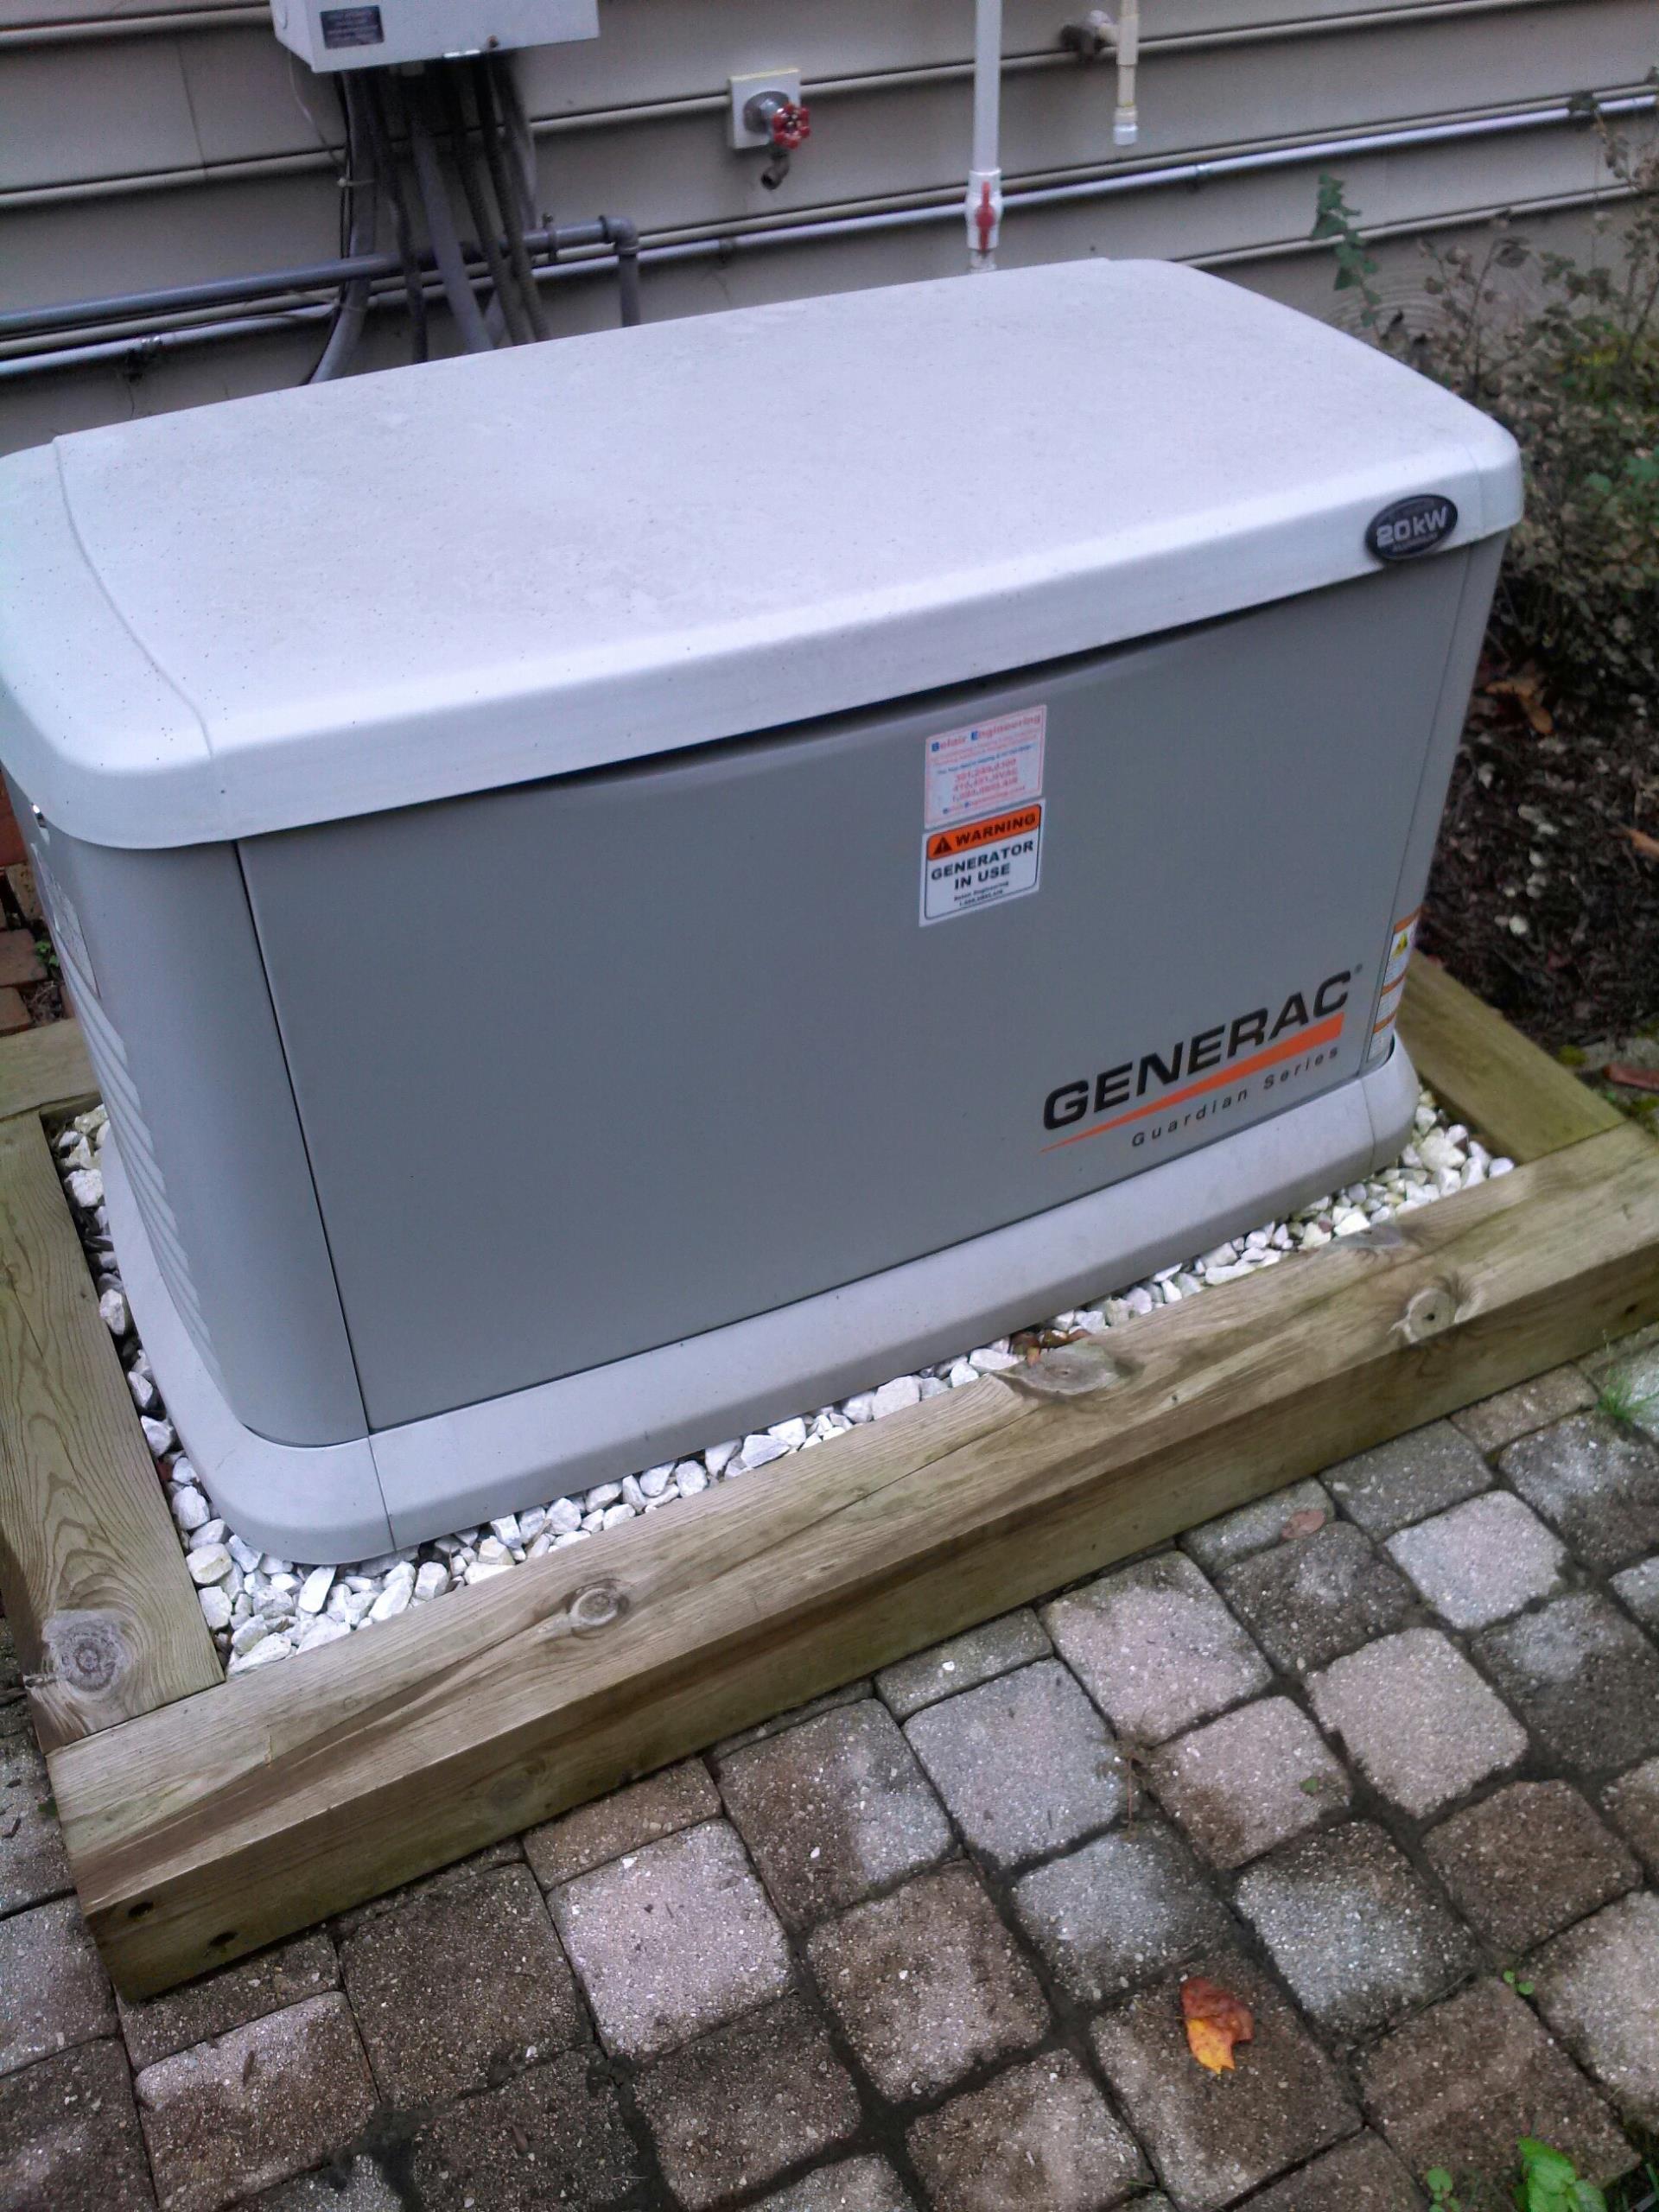 Crofton, MD - Generac 20 kw standby generator installation repair service call Crofton Maryland